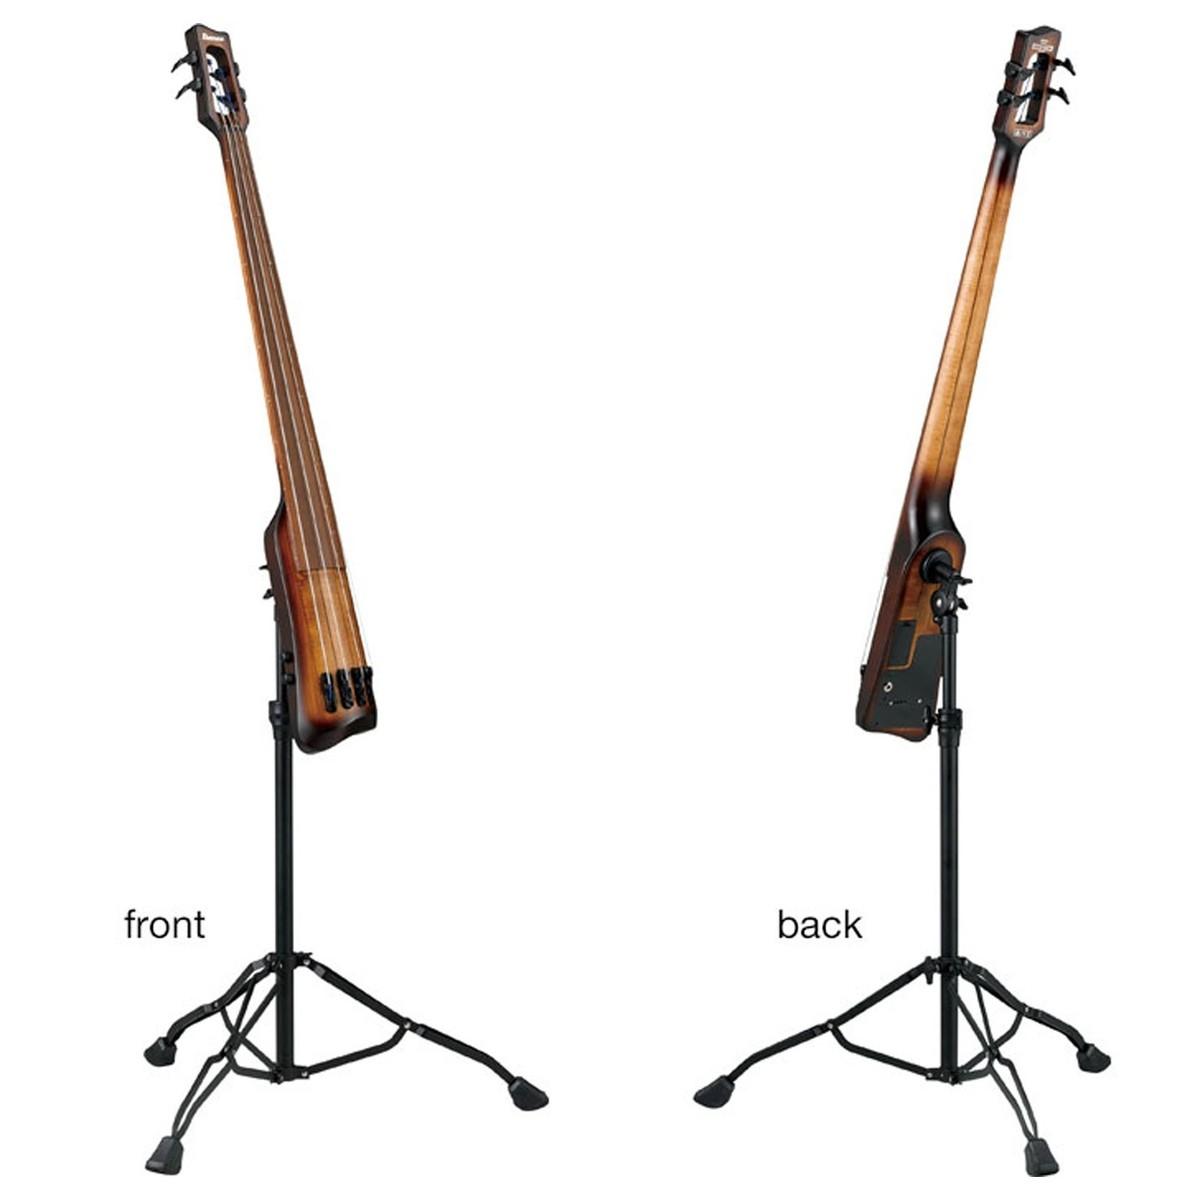 Ibanez Ub804 Fretless Bass Mahogany Oil Burst At Gear4music